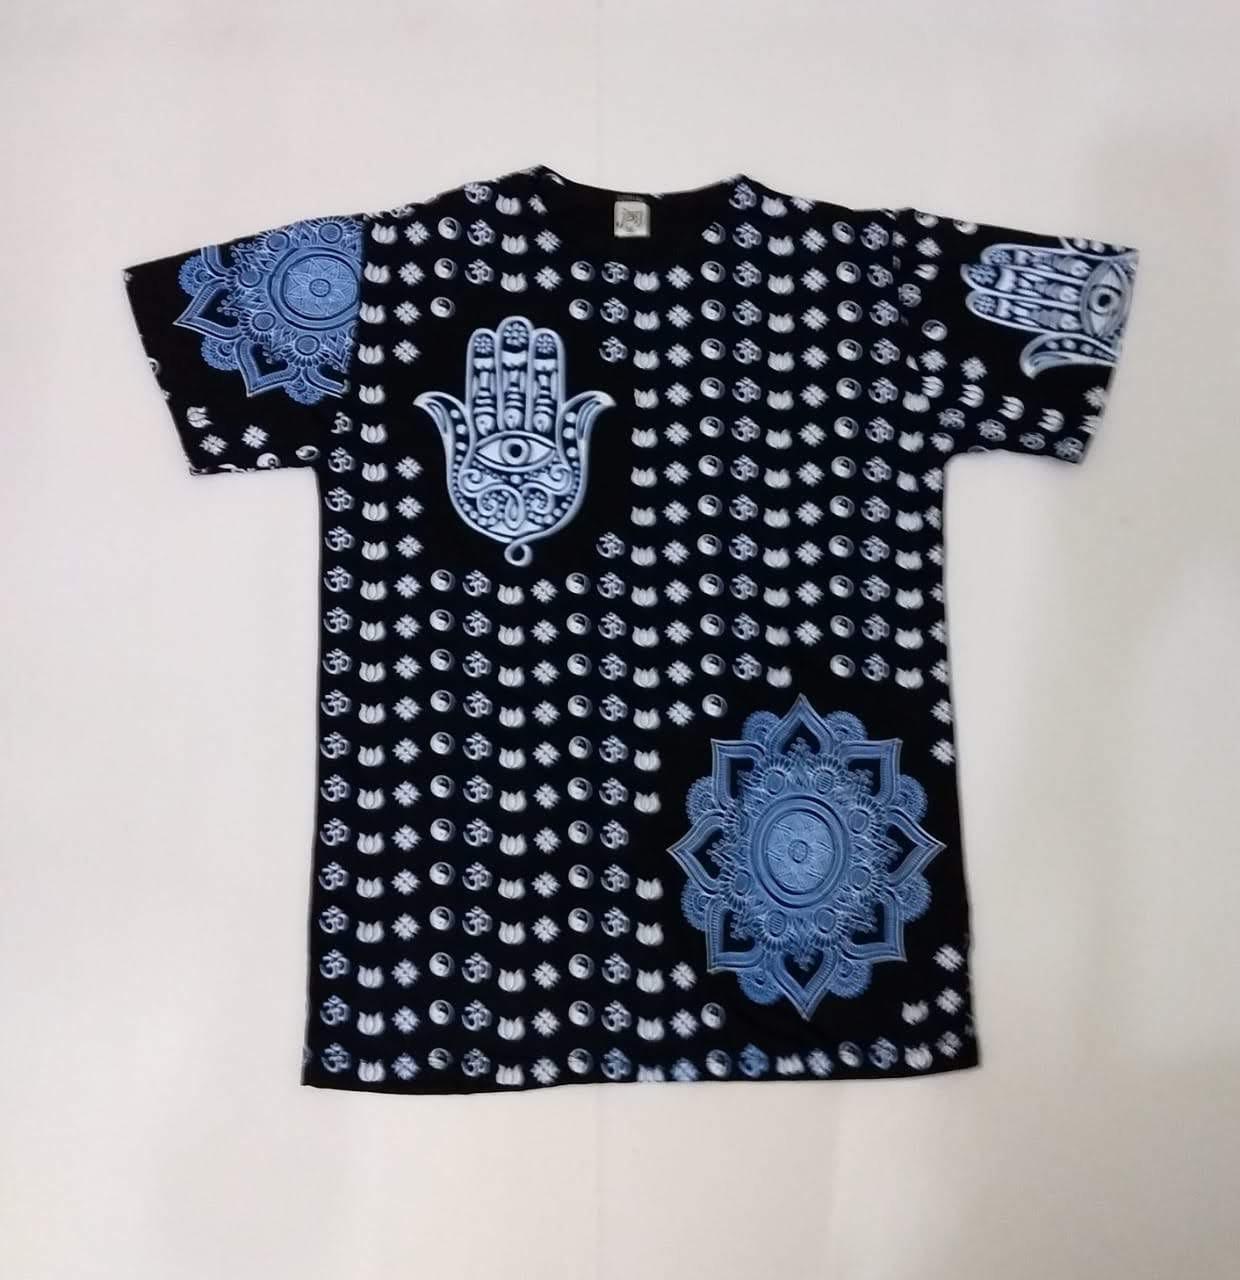 JA003 - Camiseta Preta (Mandala c/ Hamsa)